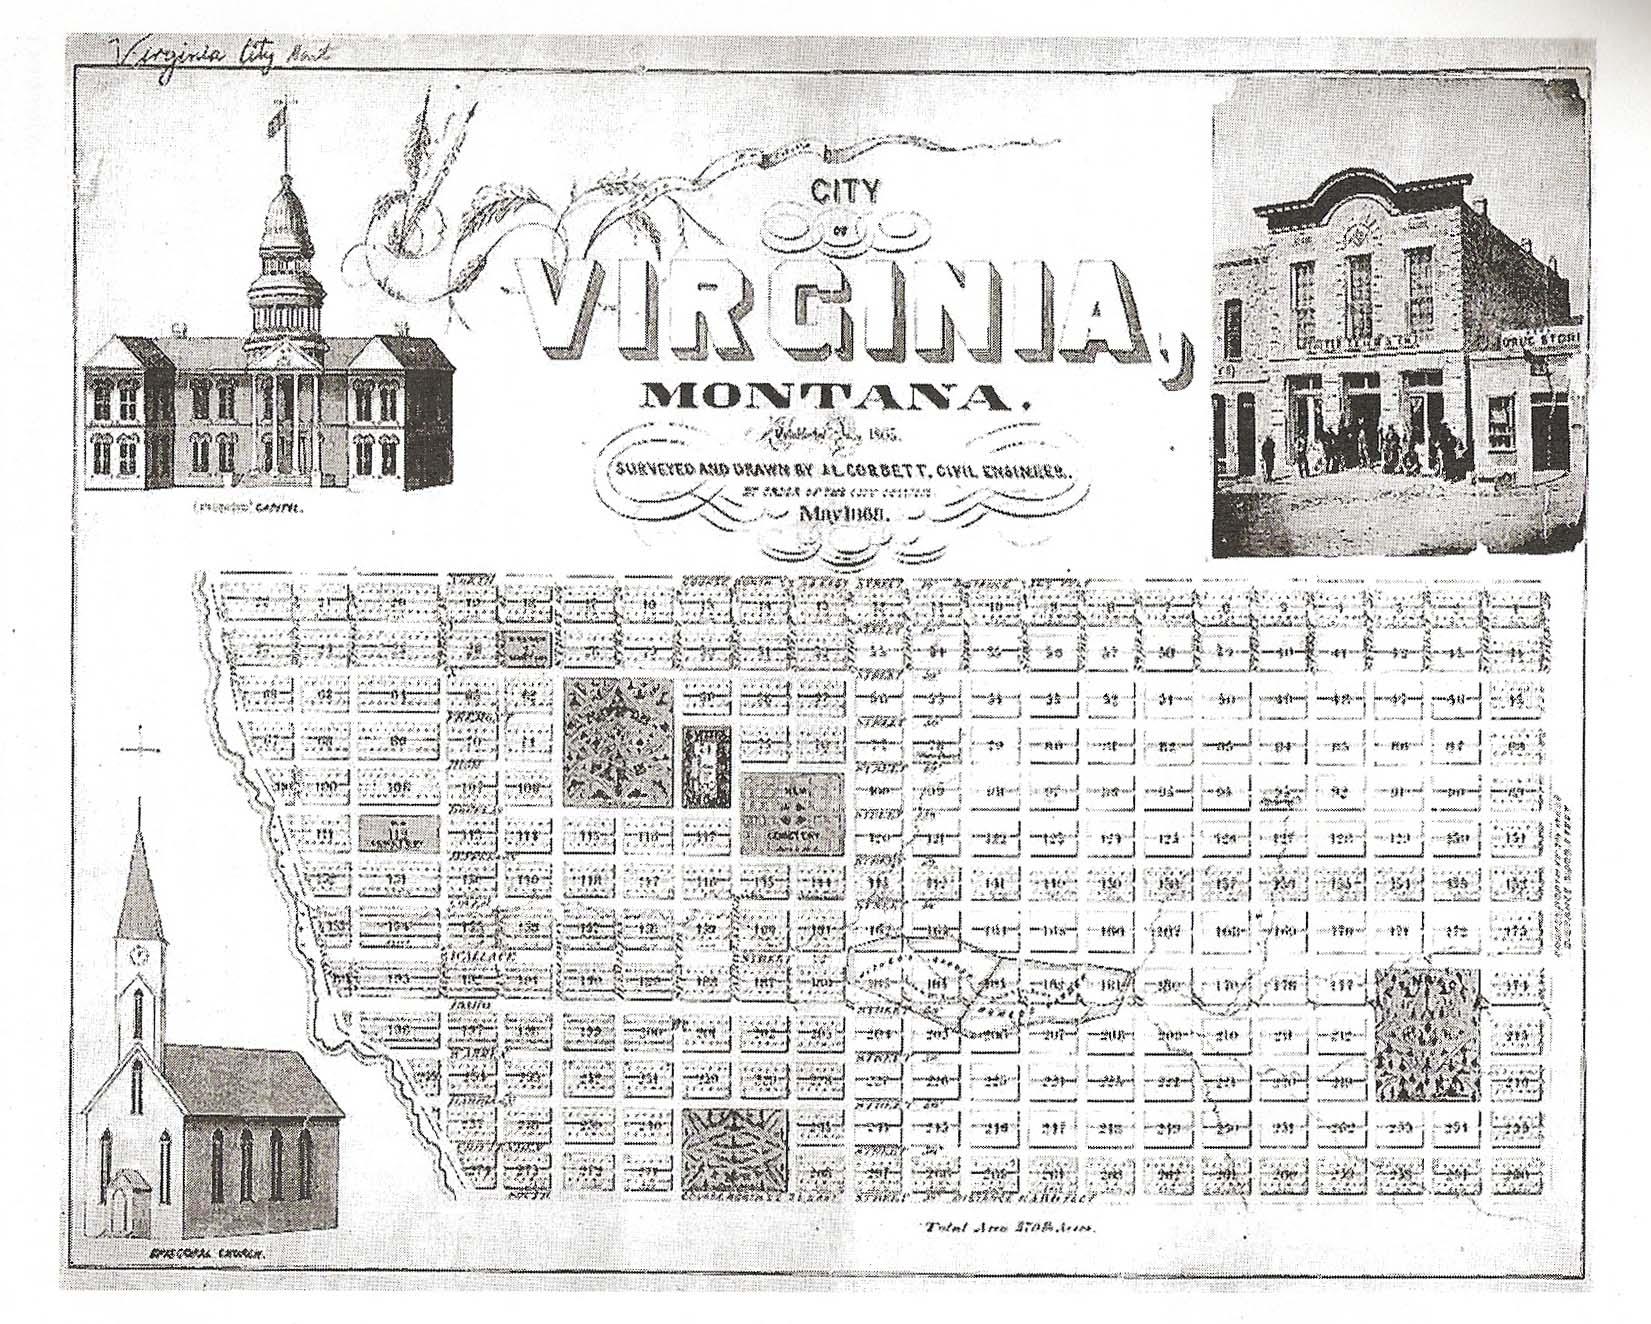 1868 Plat Map